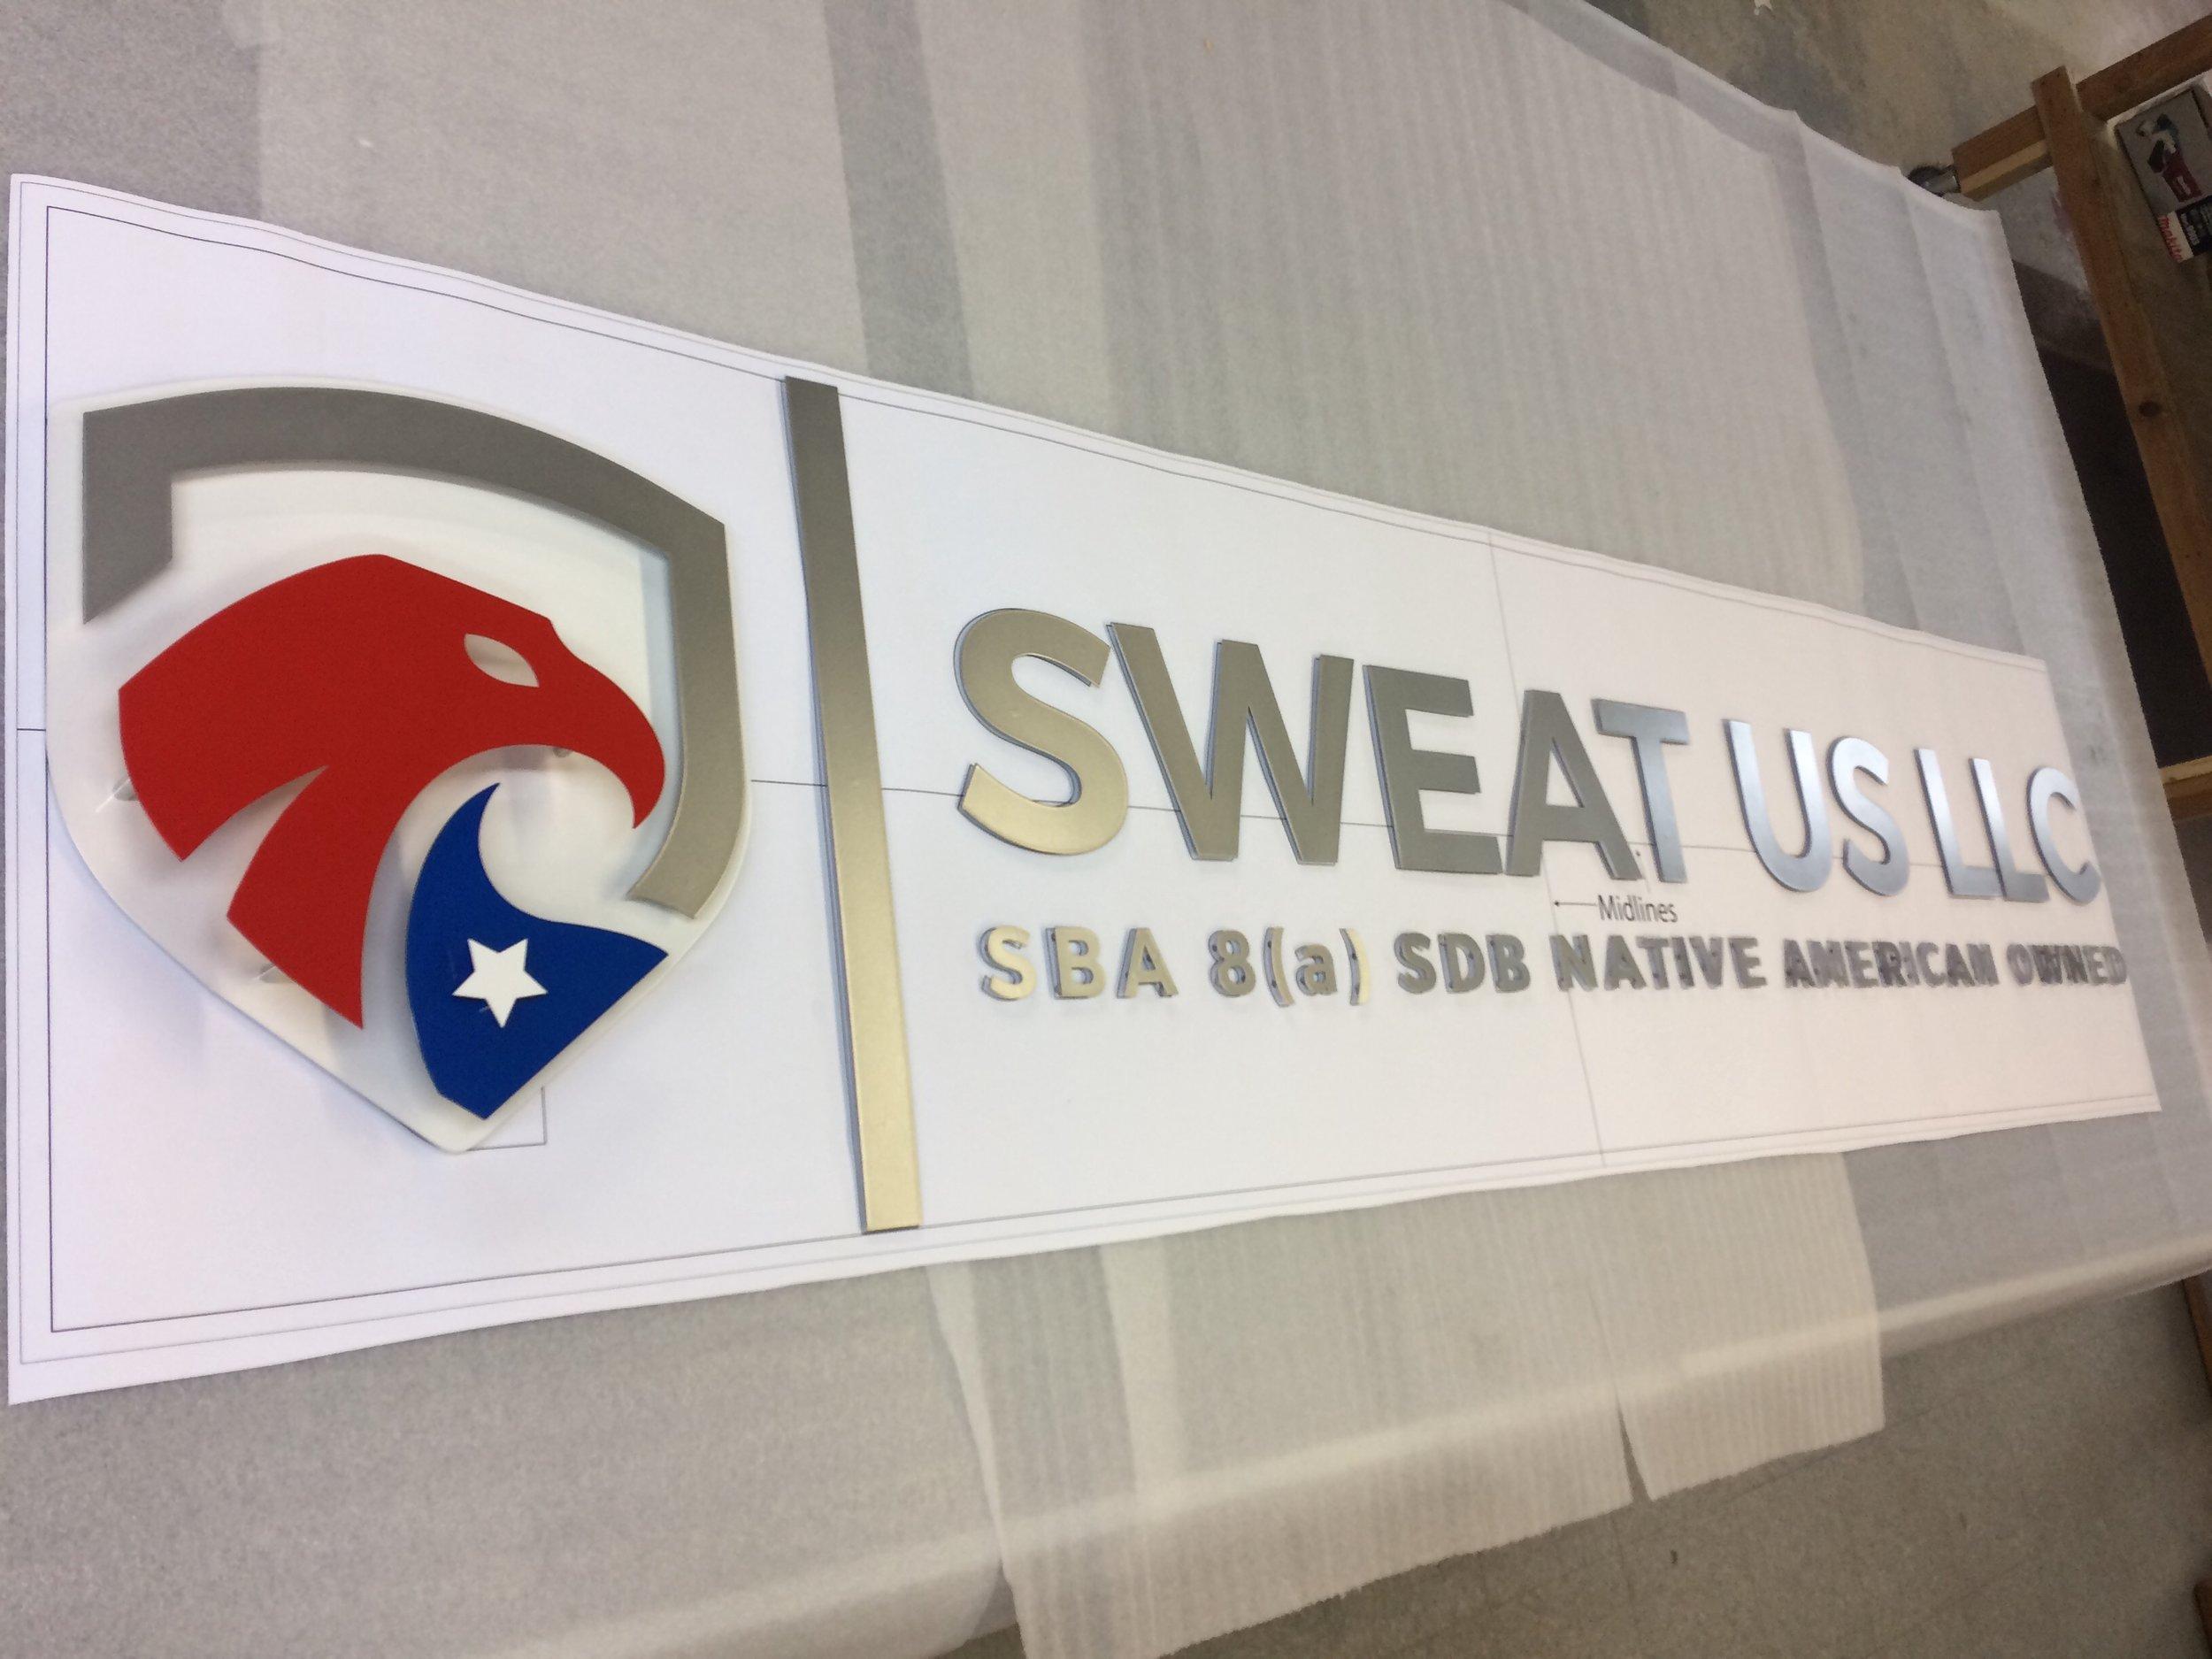 Custom Metal Sign-Sweat Us LLC-left.JPG